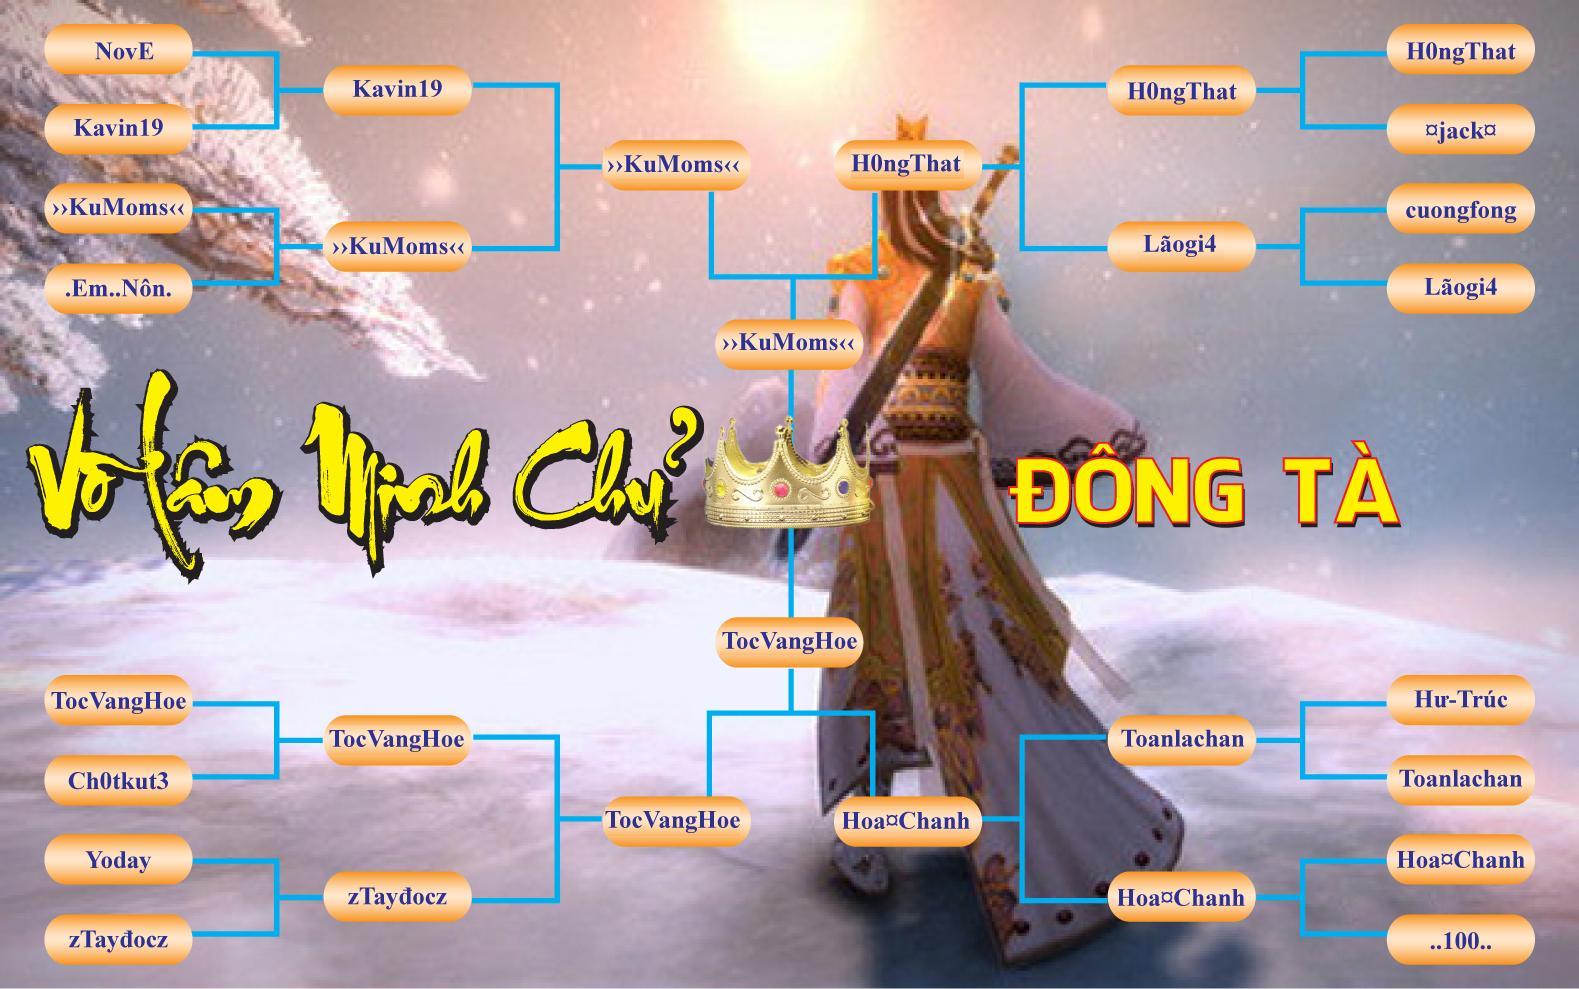 Comgame-offlineseri-game-doraemon-nobita-va-Ninja School 3 crack Mua Free O